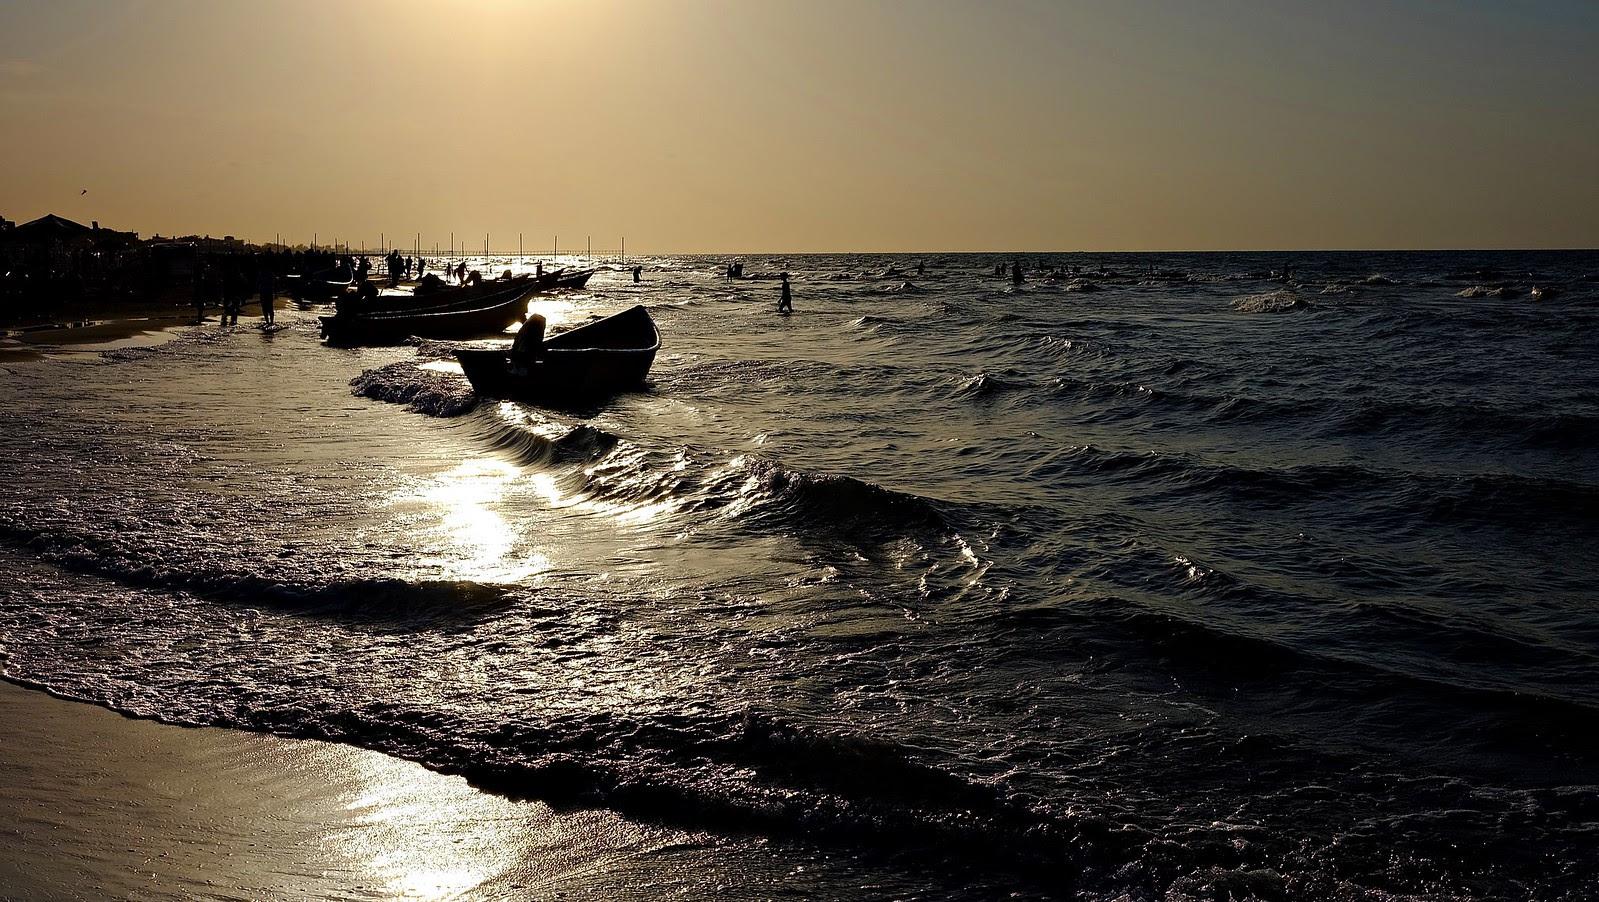 Babolsar Beach , Caspian Sea - Iran